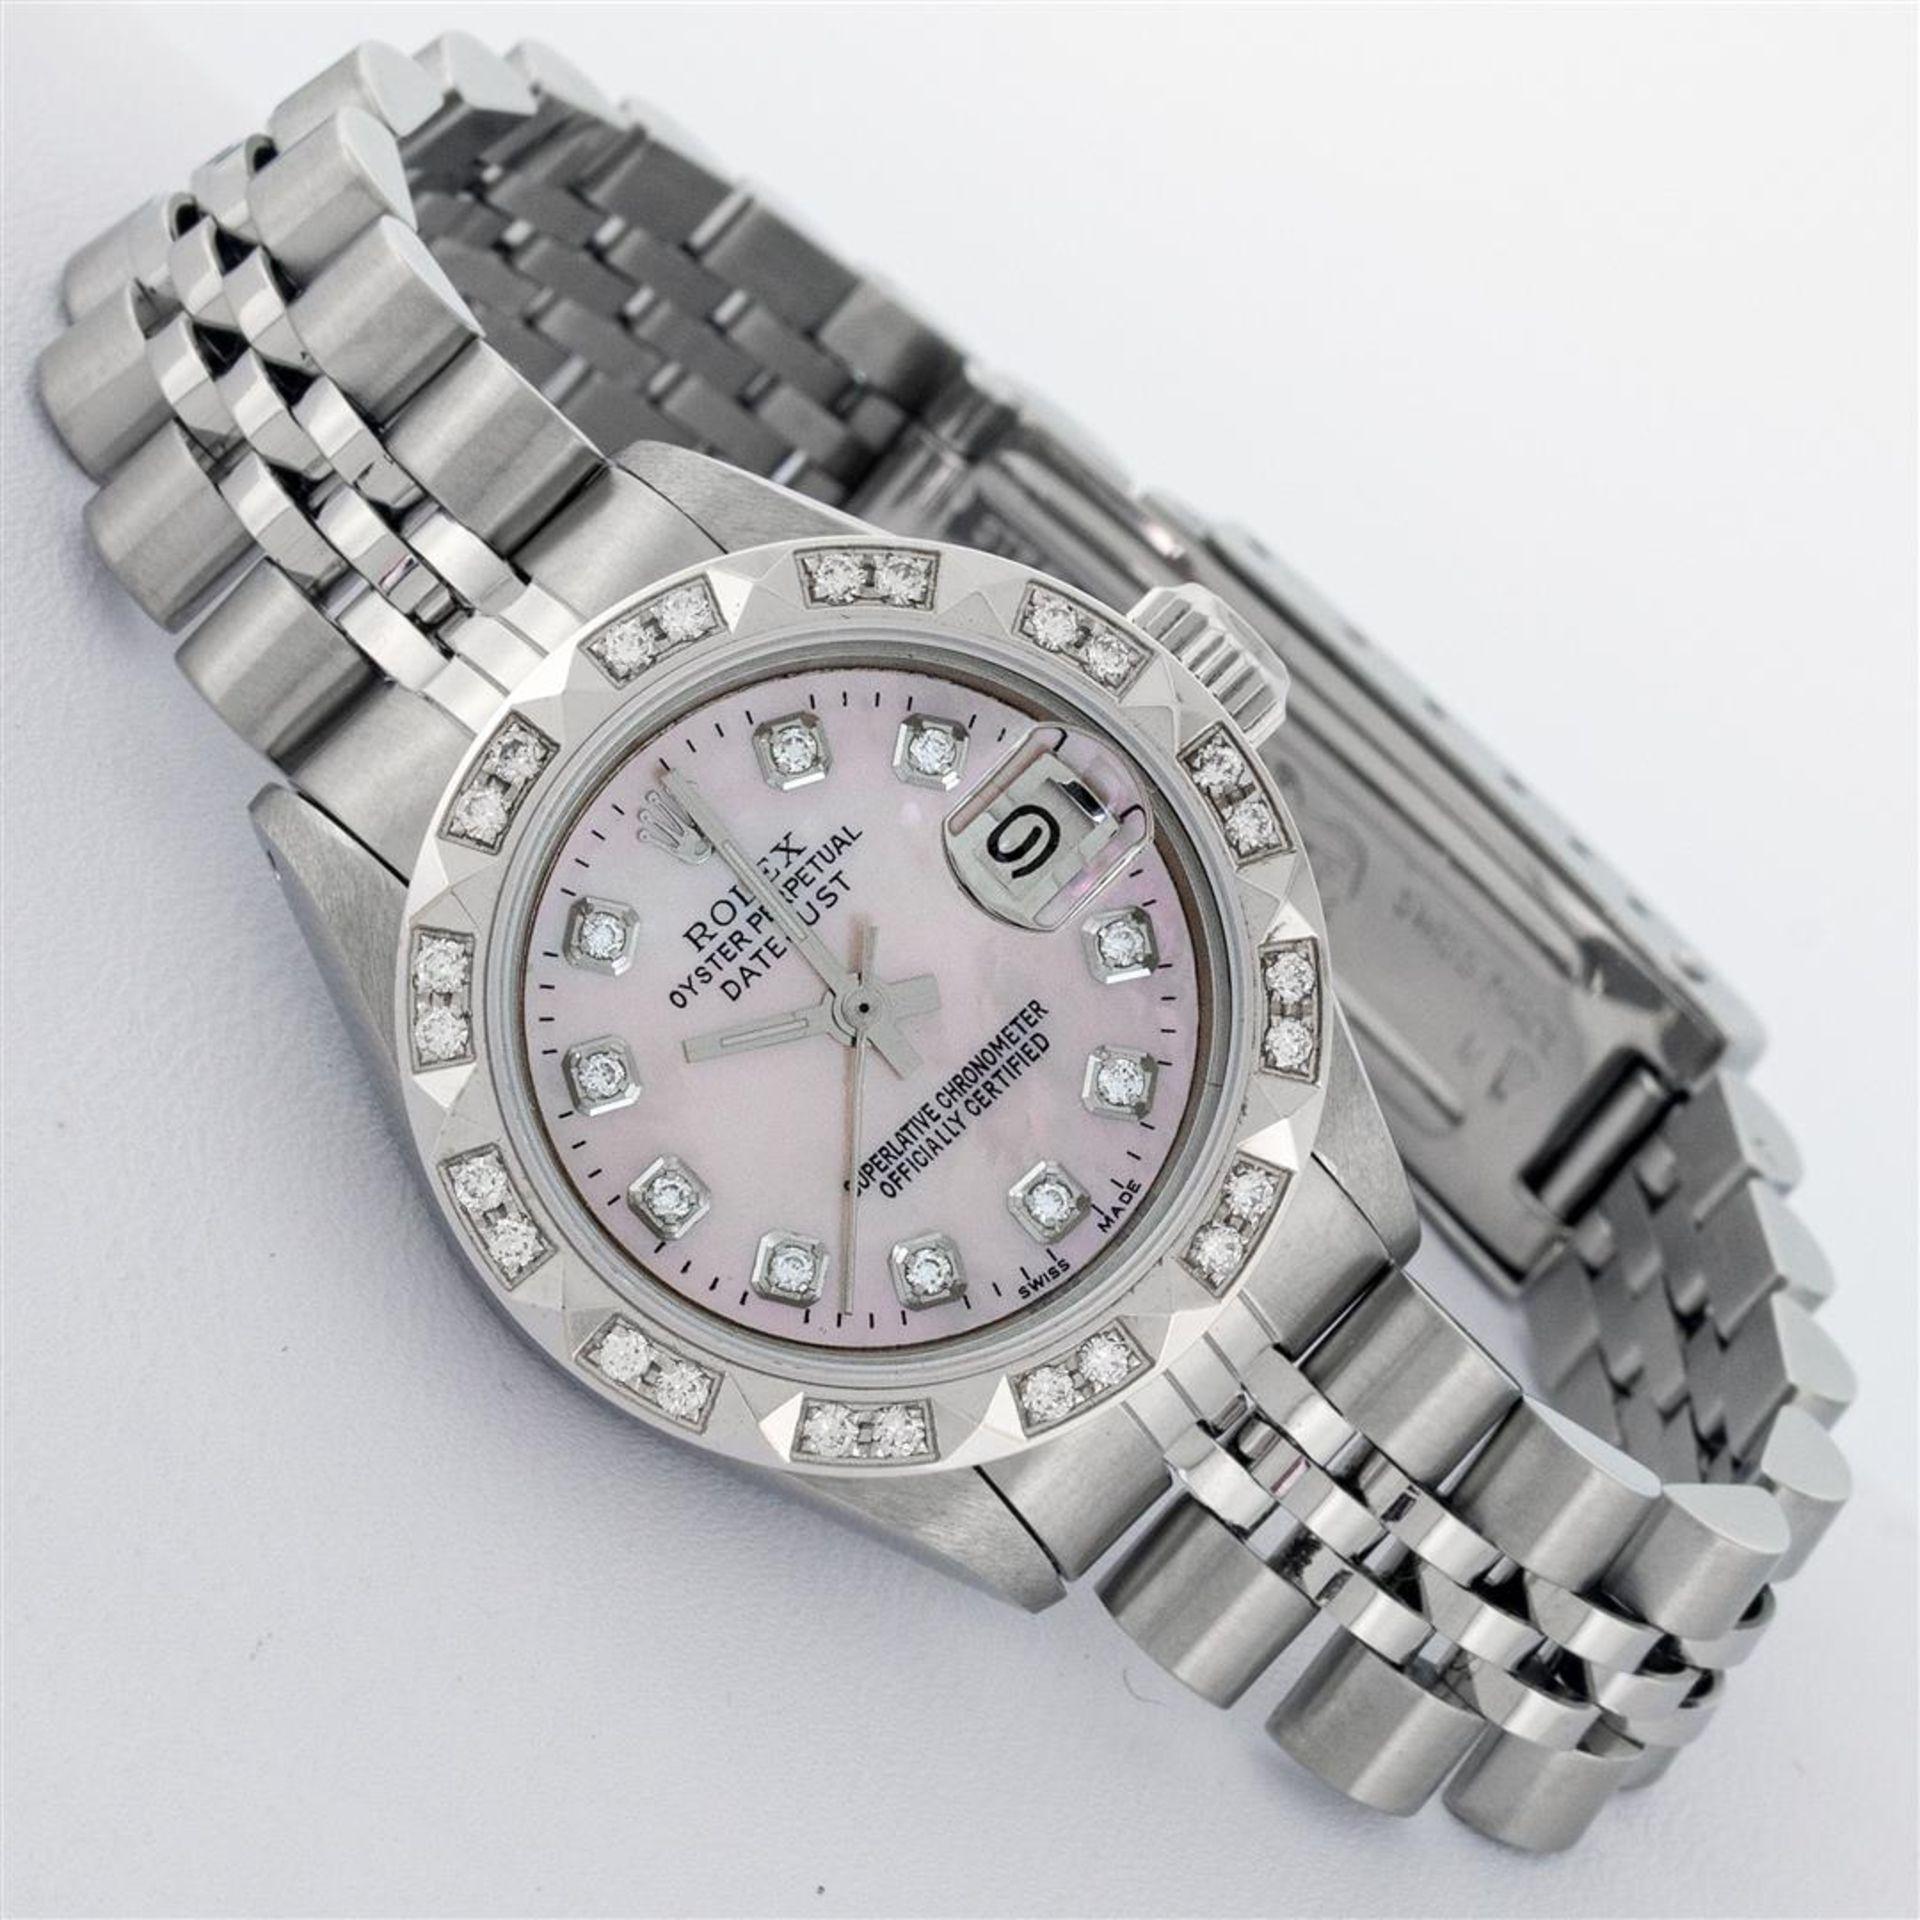 Rolex Ladies Stainless Steel Pink MOP Pyramid Diamond Datejust Wristwatch 26MM - Image 2 of 9